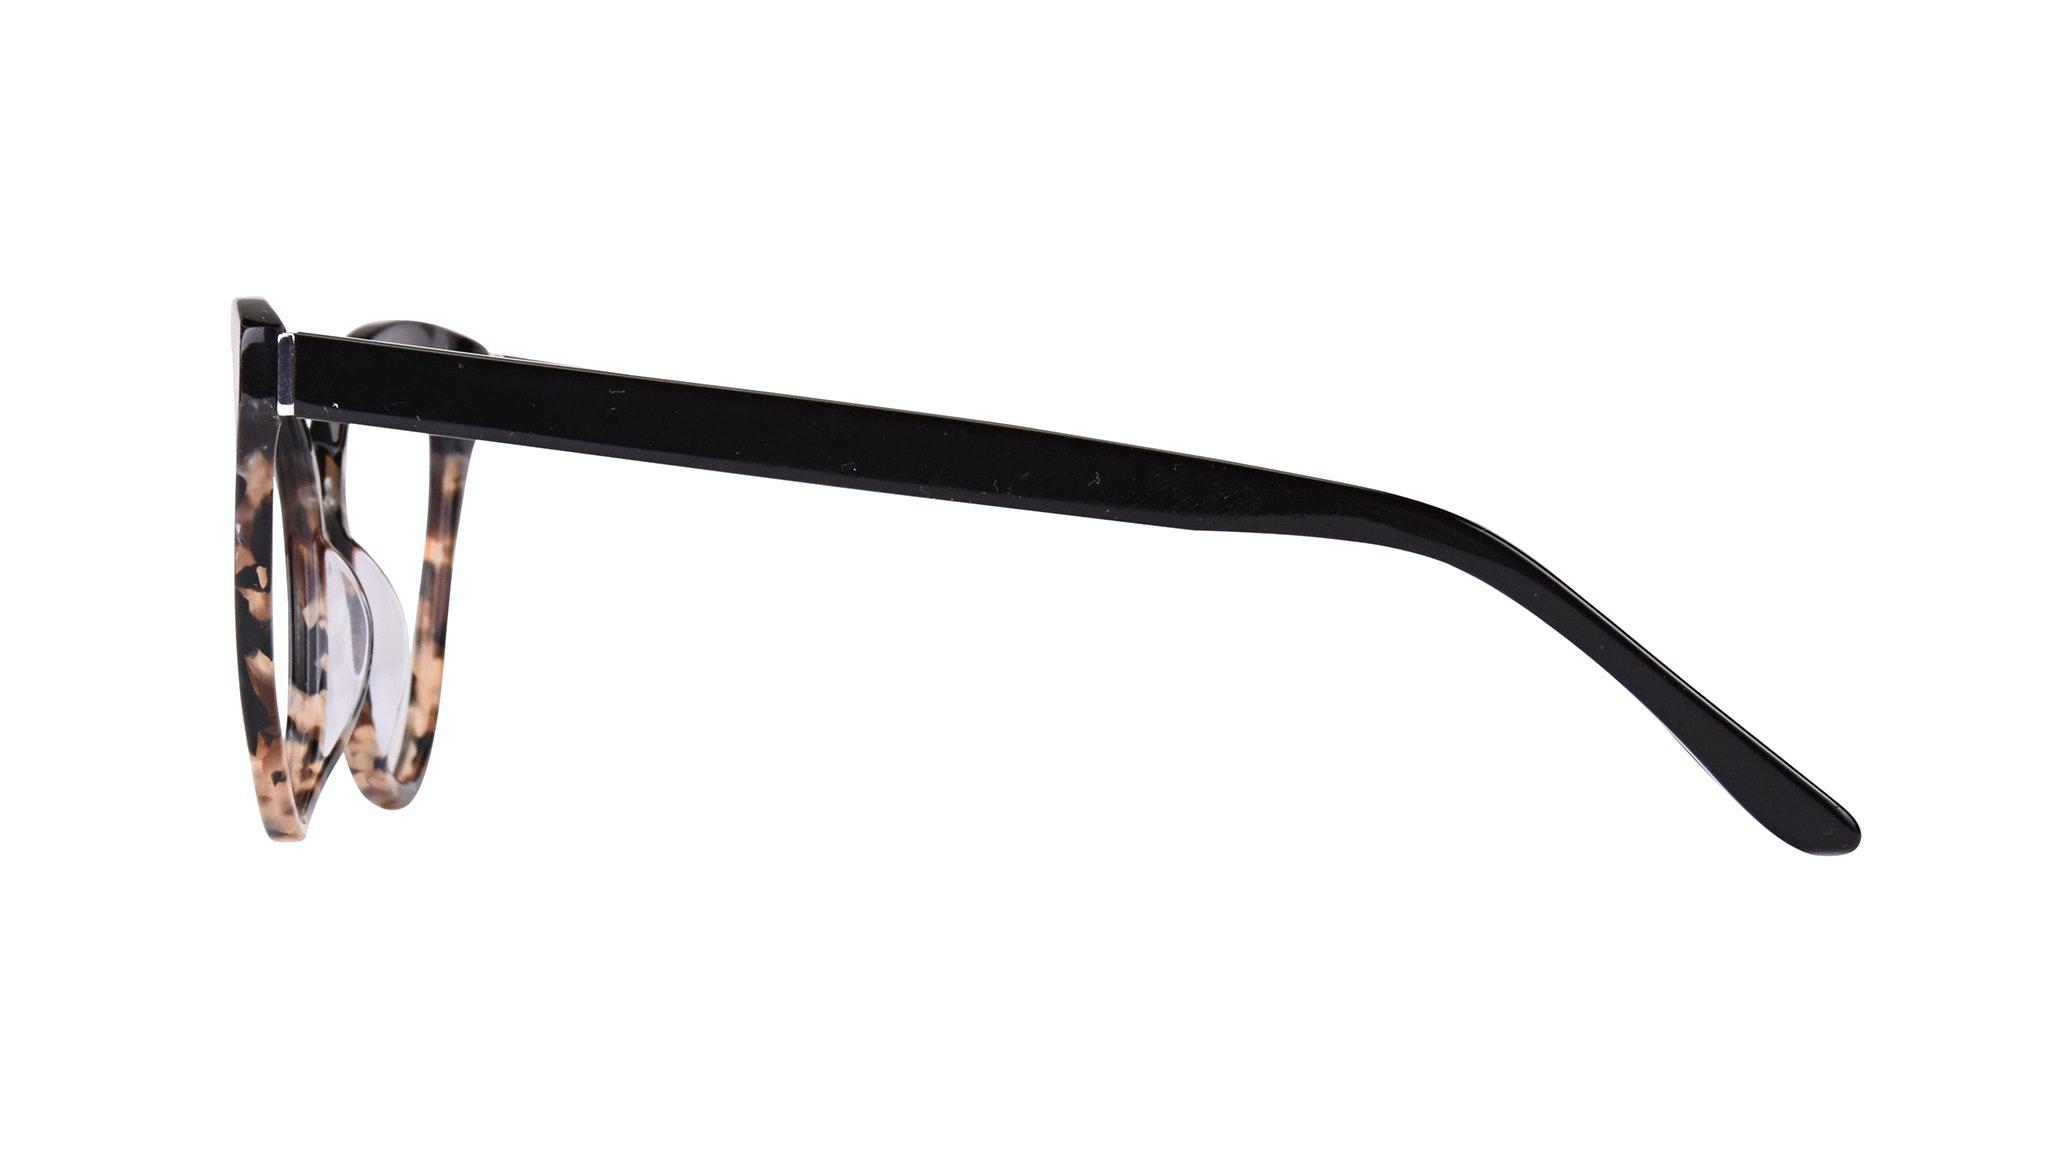 Affordable Fashion Glasses Cat Eye Daring Cateye Eyeglasses Women Reverie Dark Tortoise Side